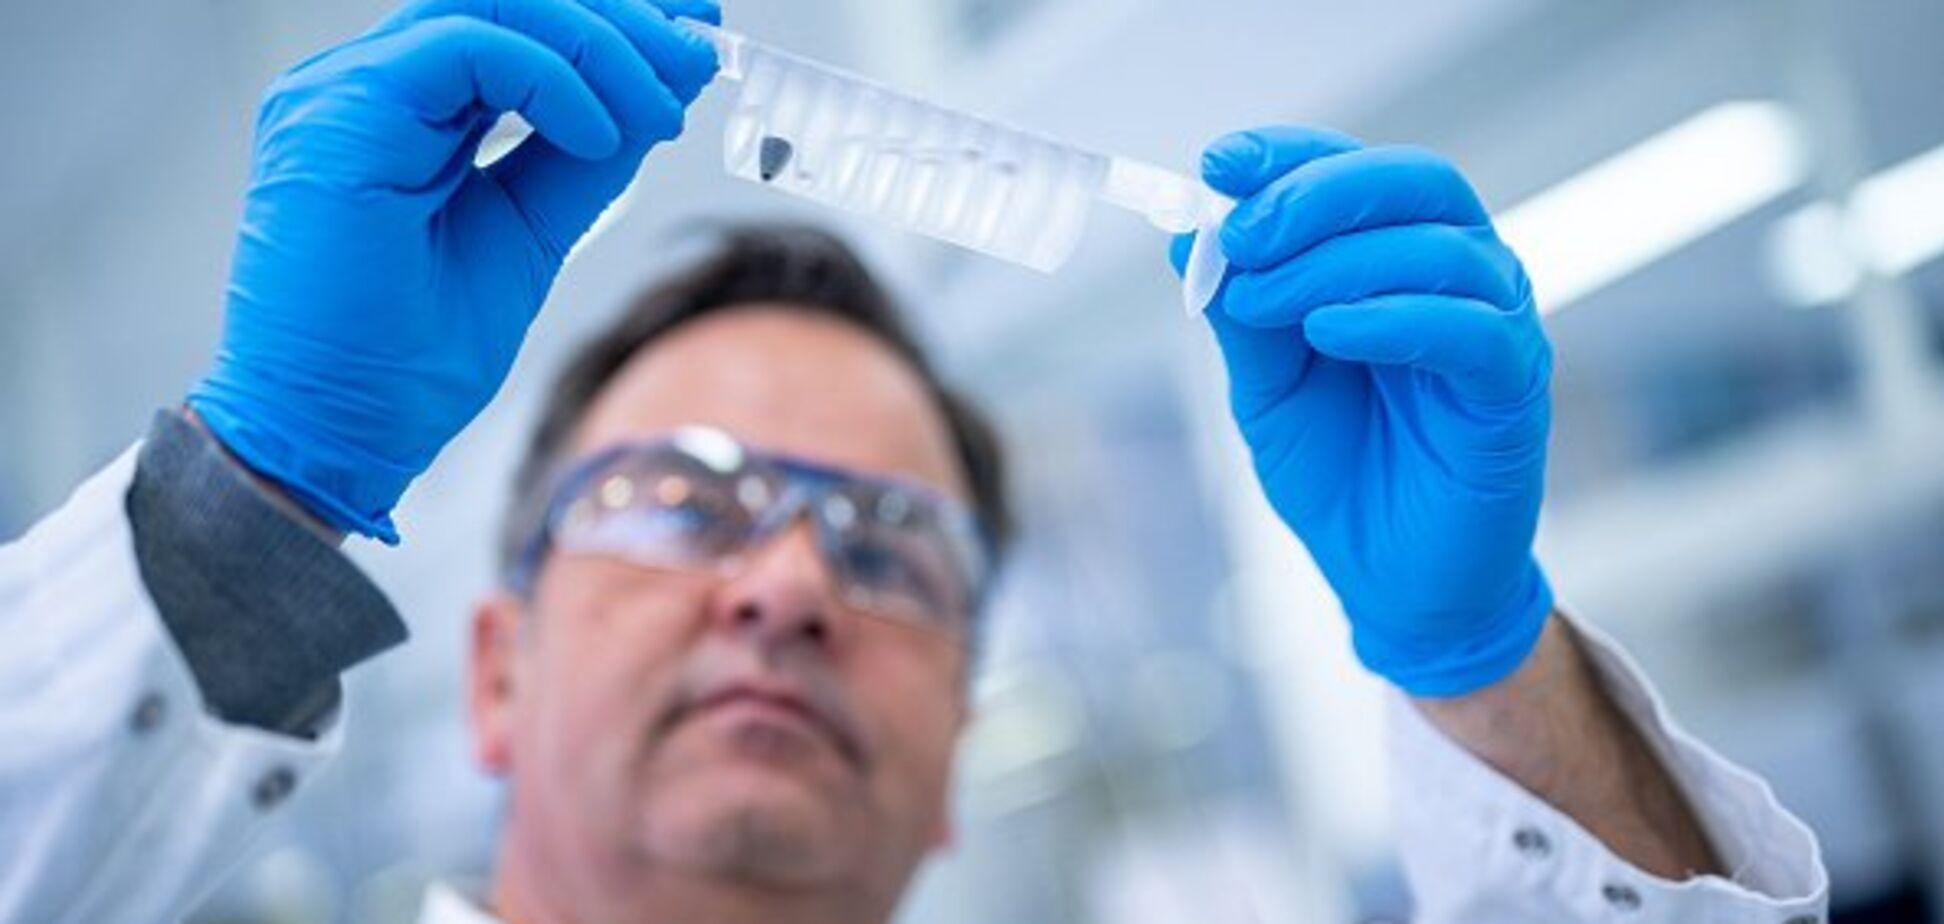 Украина получит лекарство от коронавируса 'Авиган'